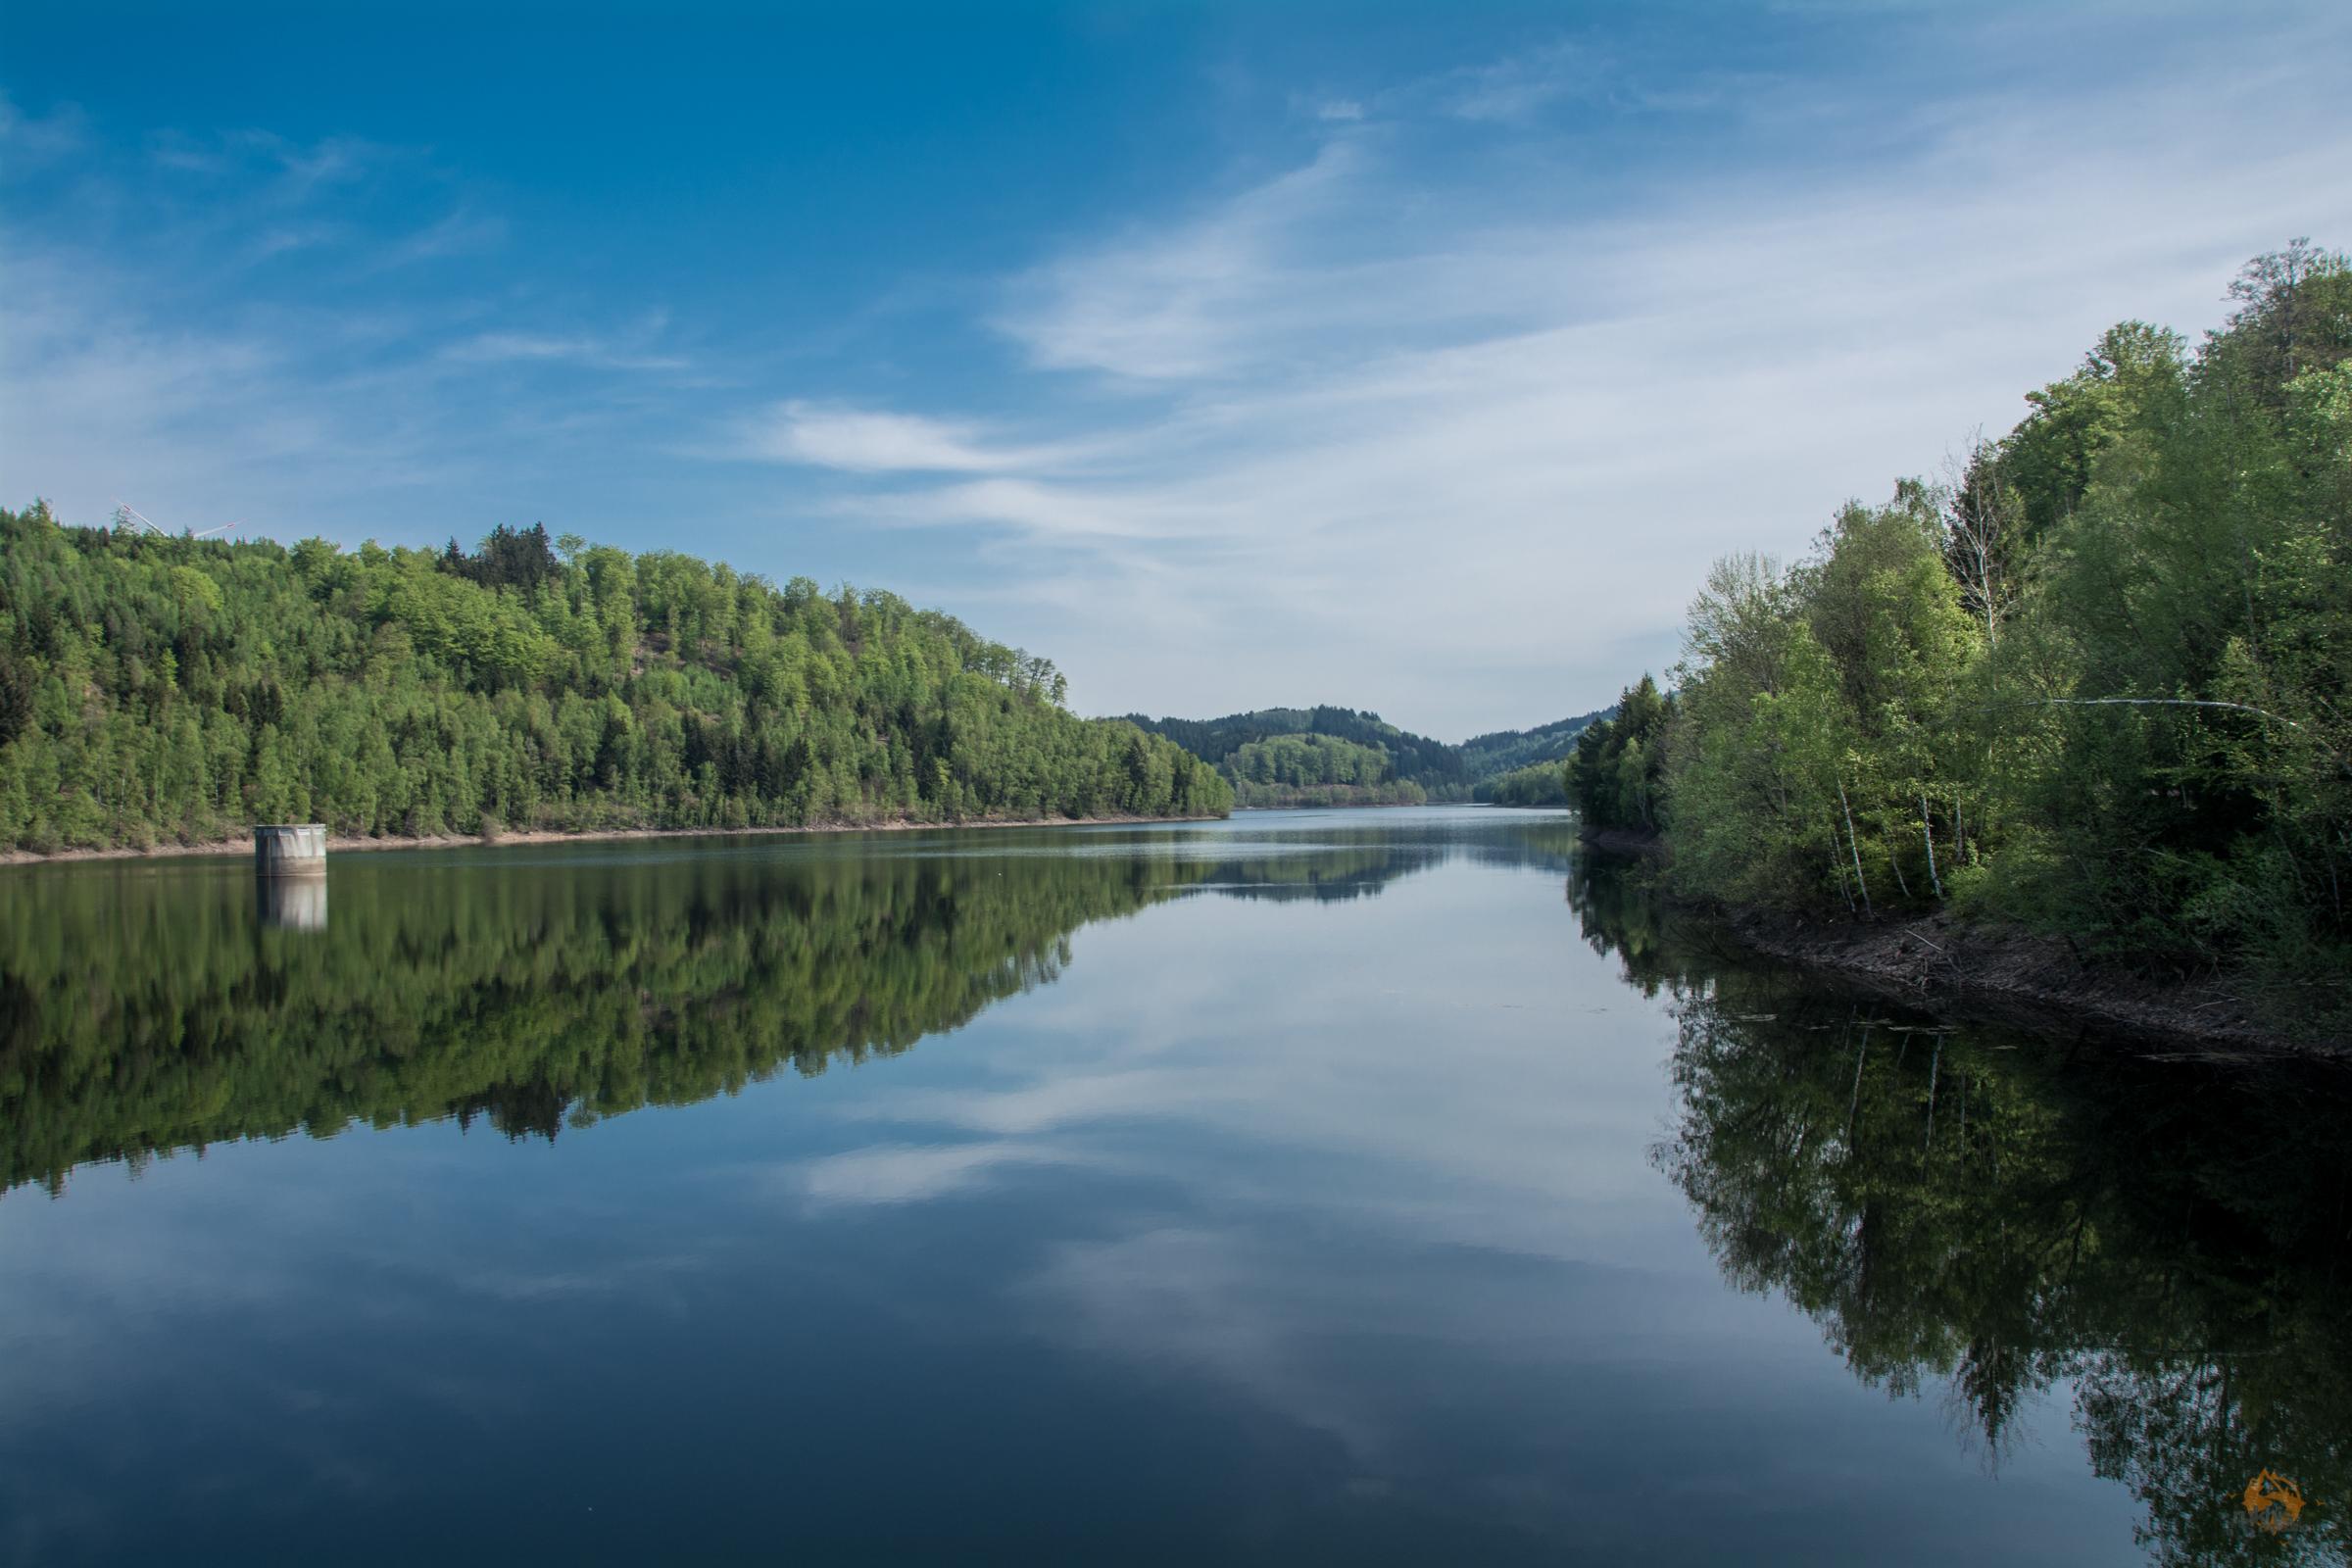 Planetenwanderweg | Seerundweg | Primstalsperre | Saarland